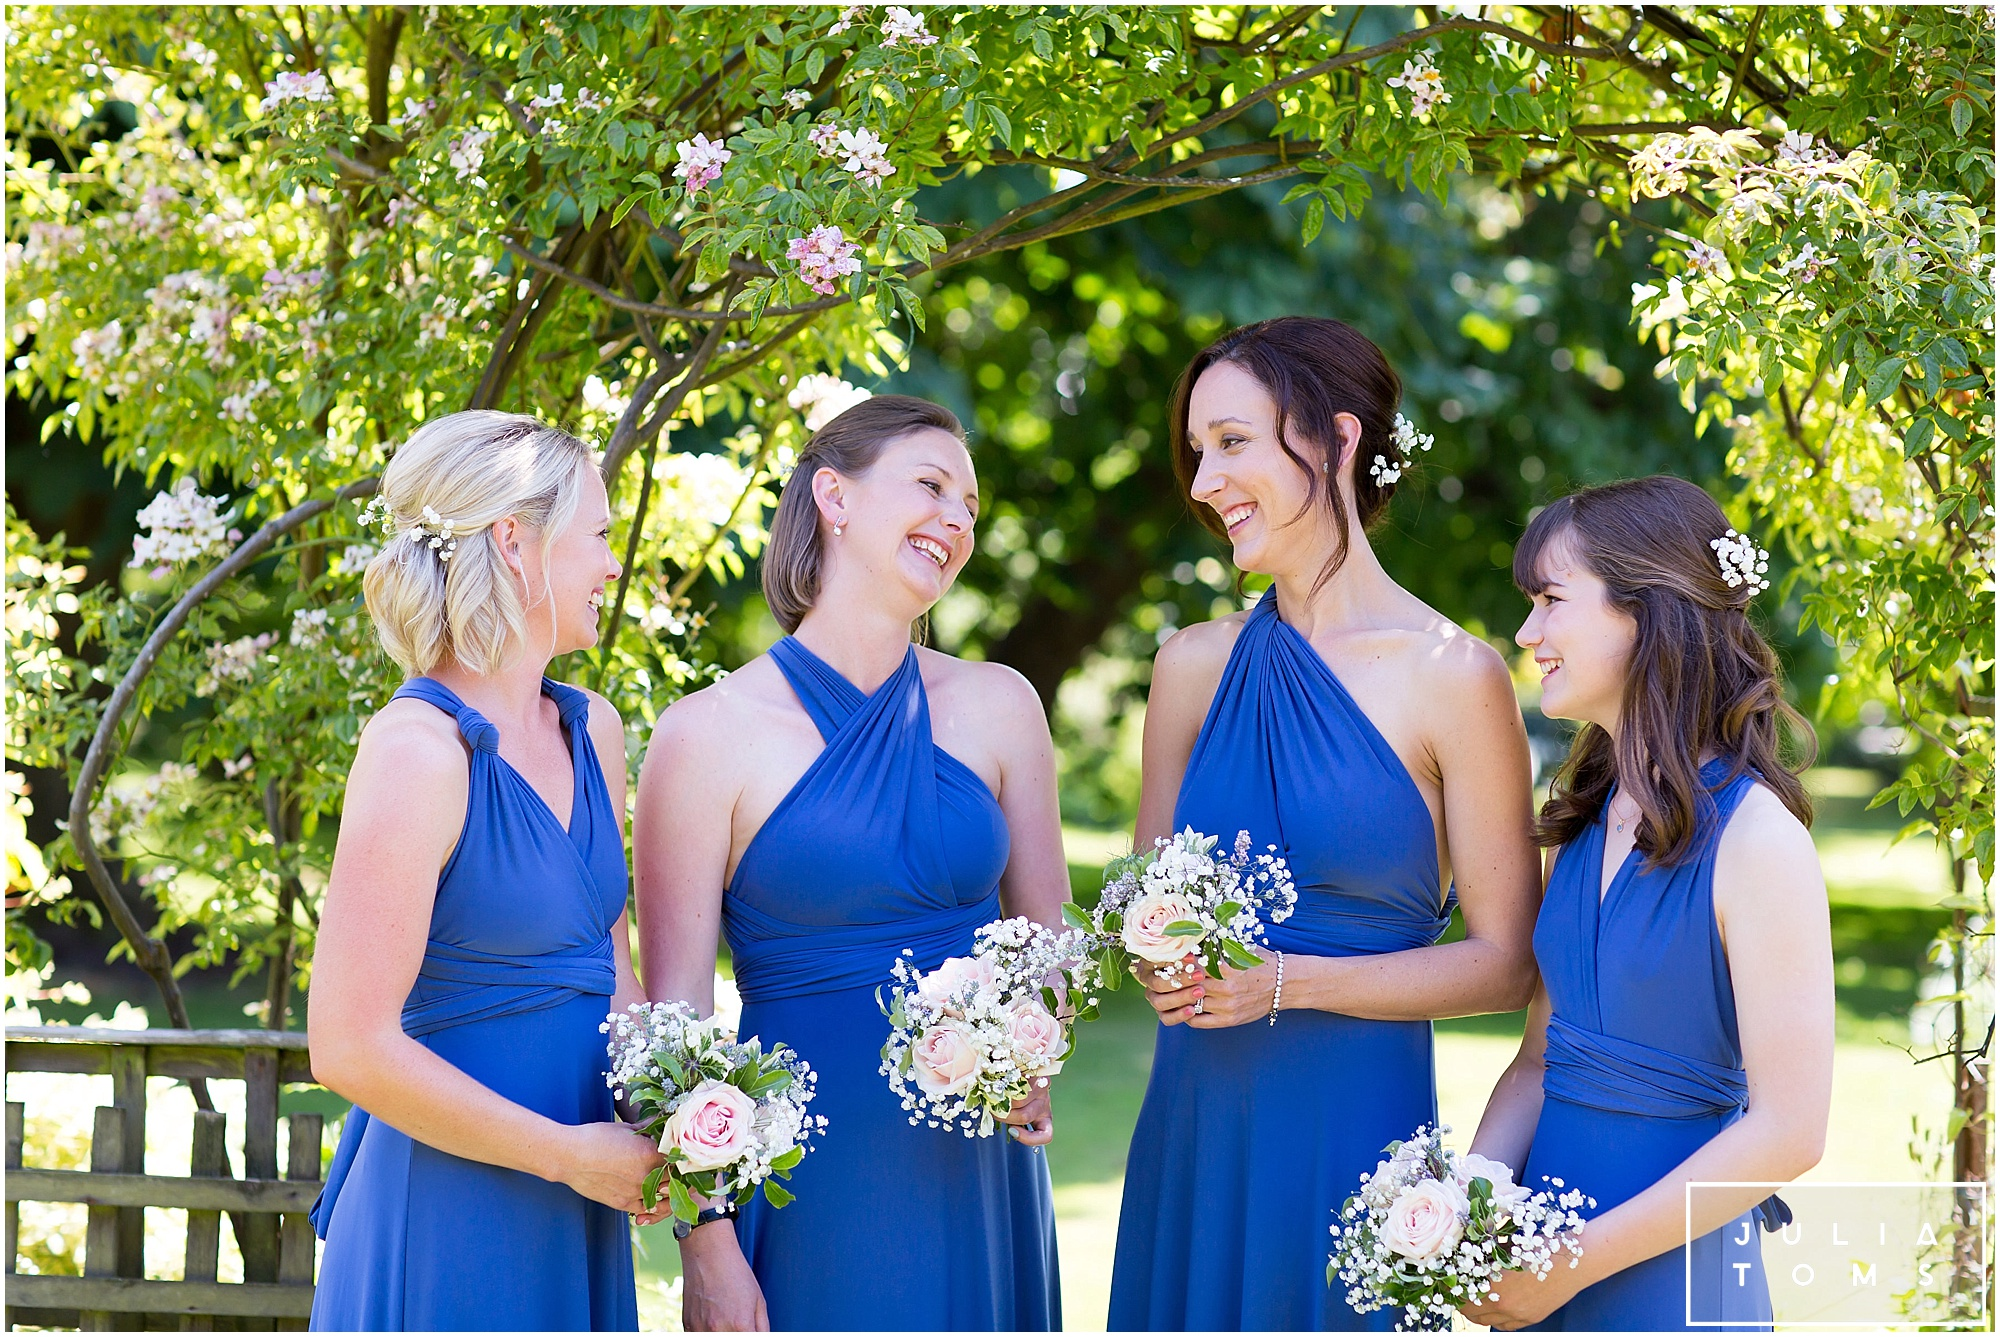 julia_toms_chichester_wedding_photographer_portsmouth_013.jpg